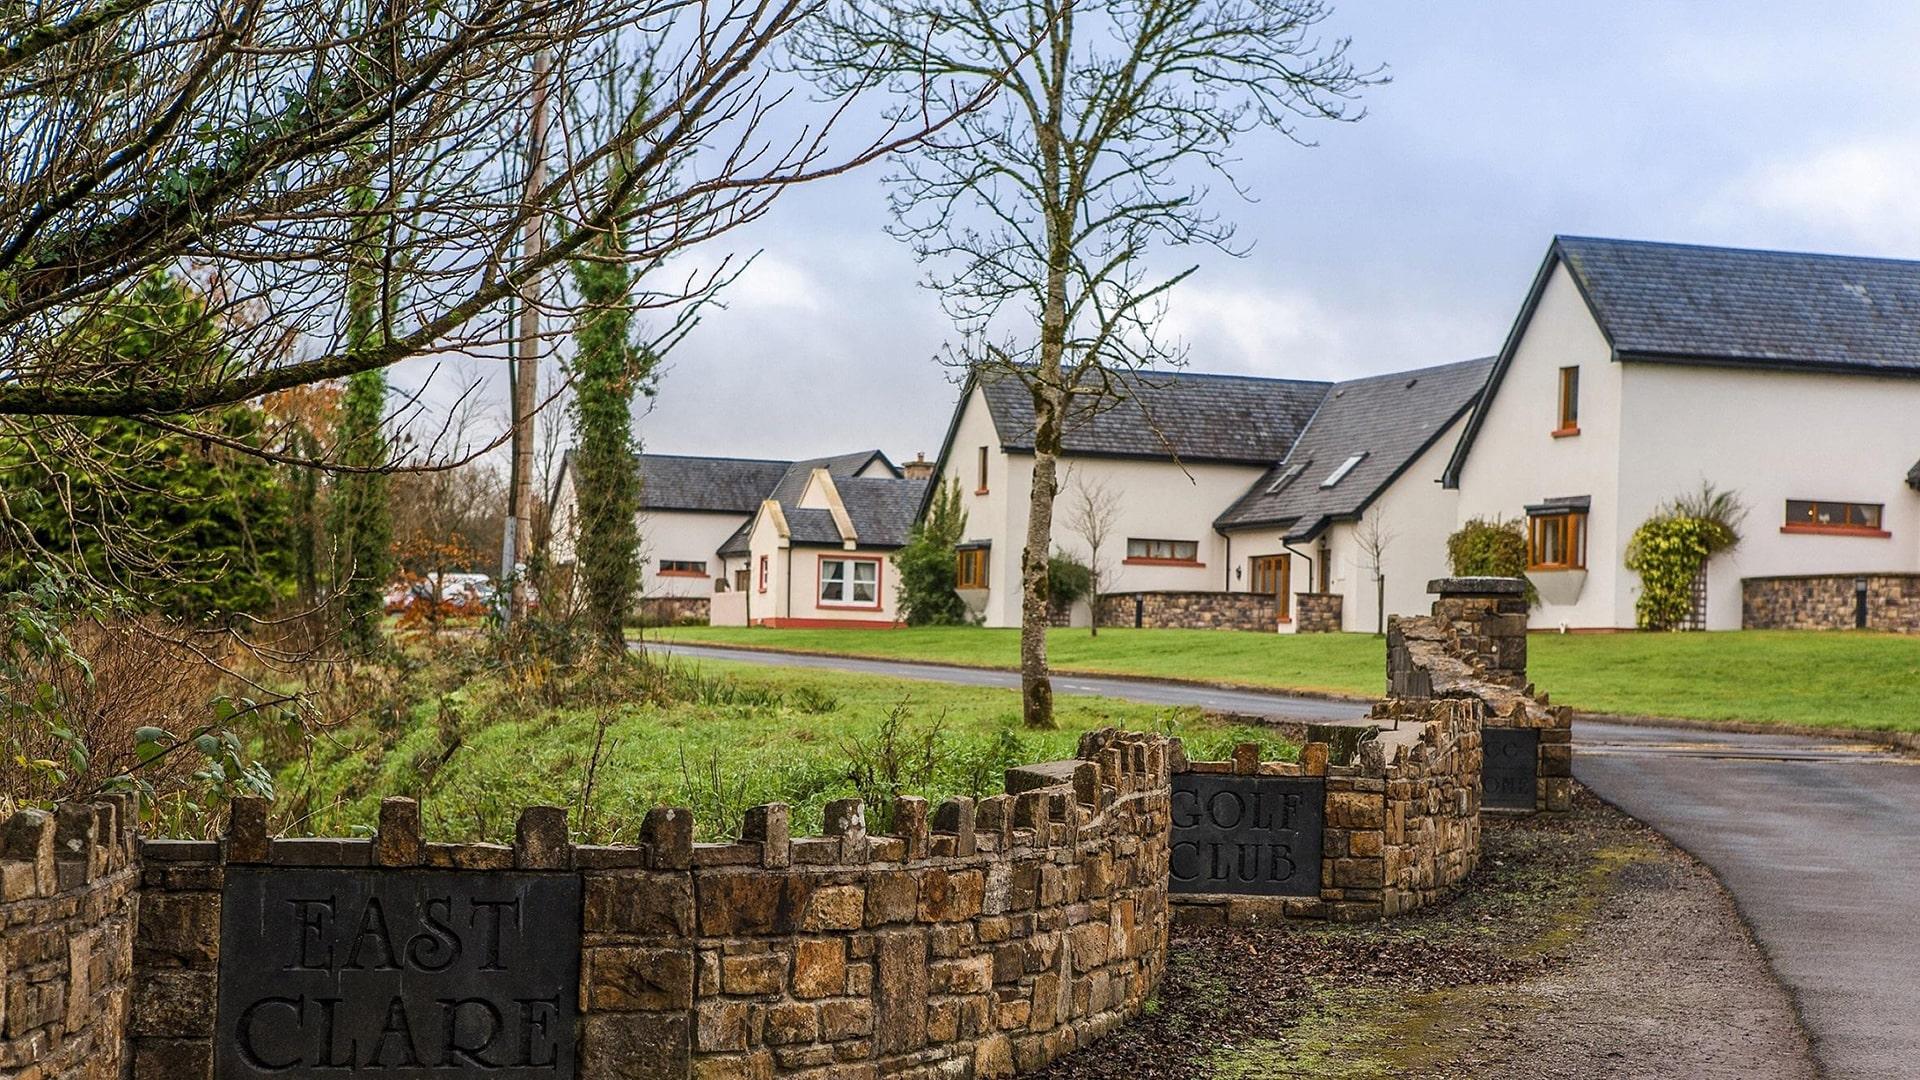 East_Clare_Golf_Village-exterior-(3)-min